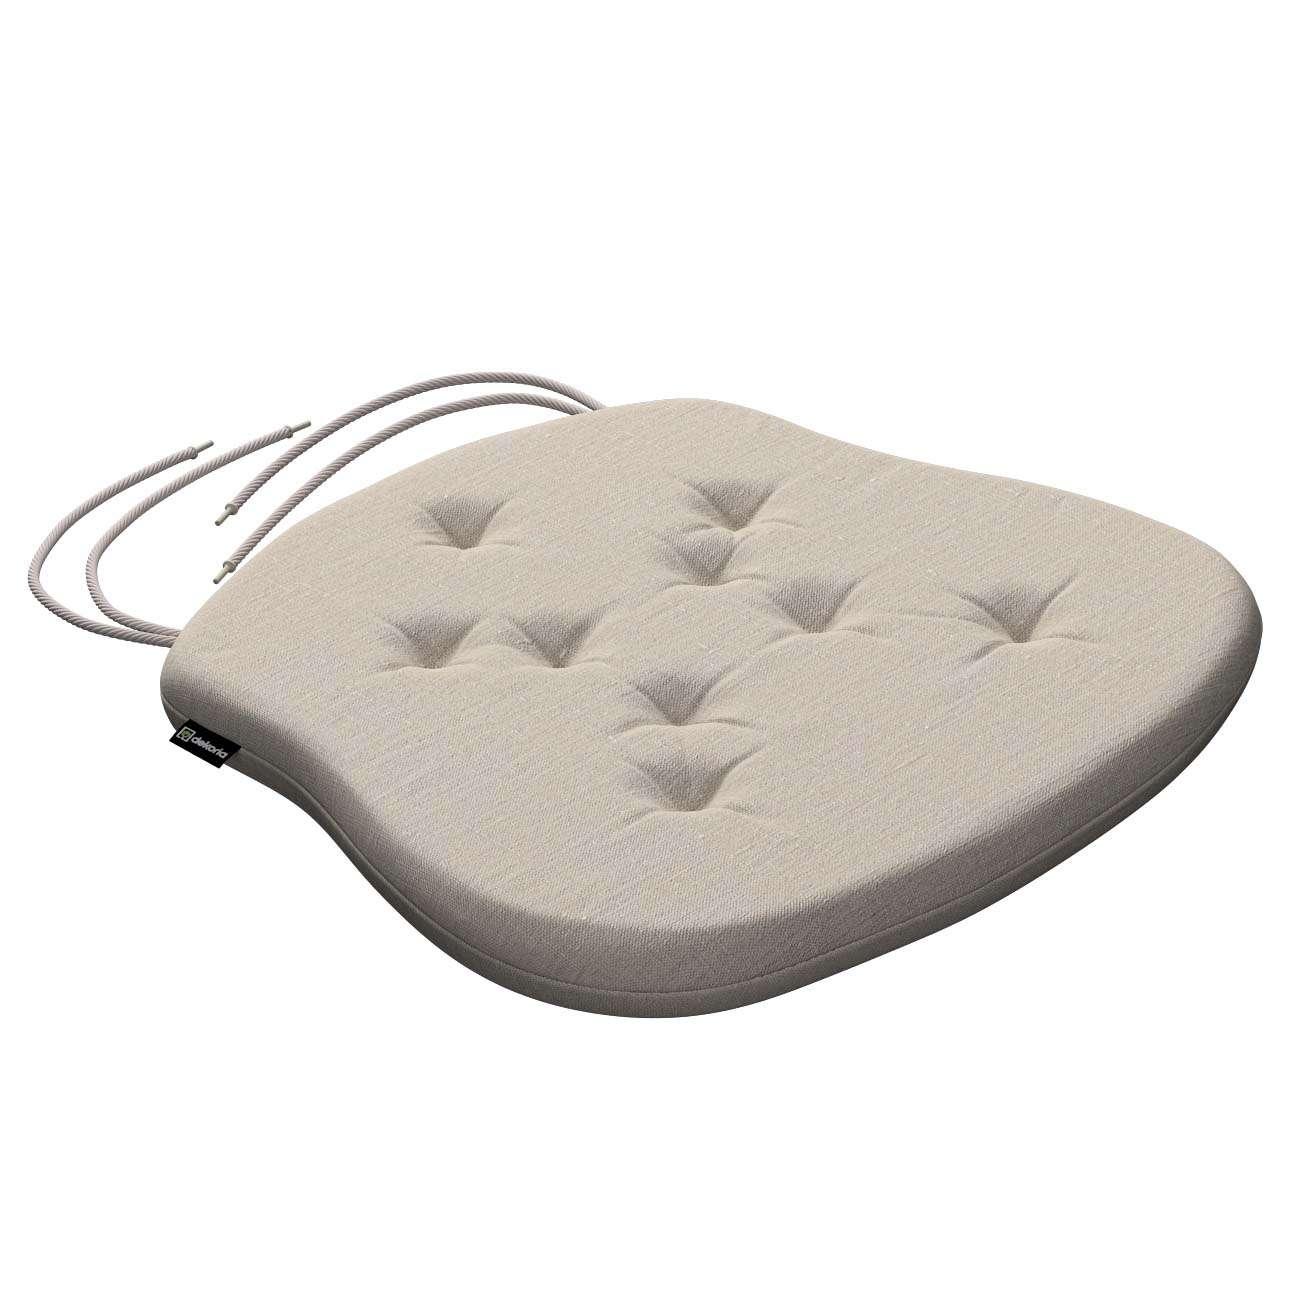 Kėdės pagalvėlė Filip  41 x 38 x 3,5 cm kolekcijoje Linen , audinys: 392-05